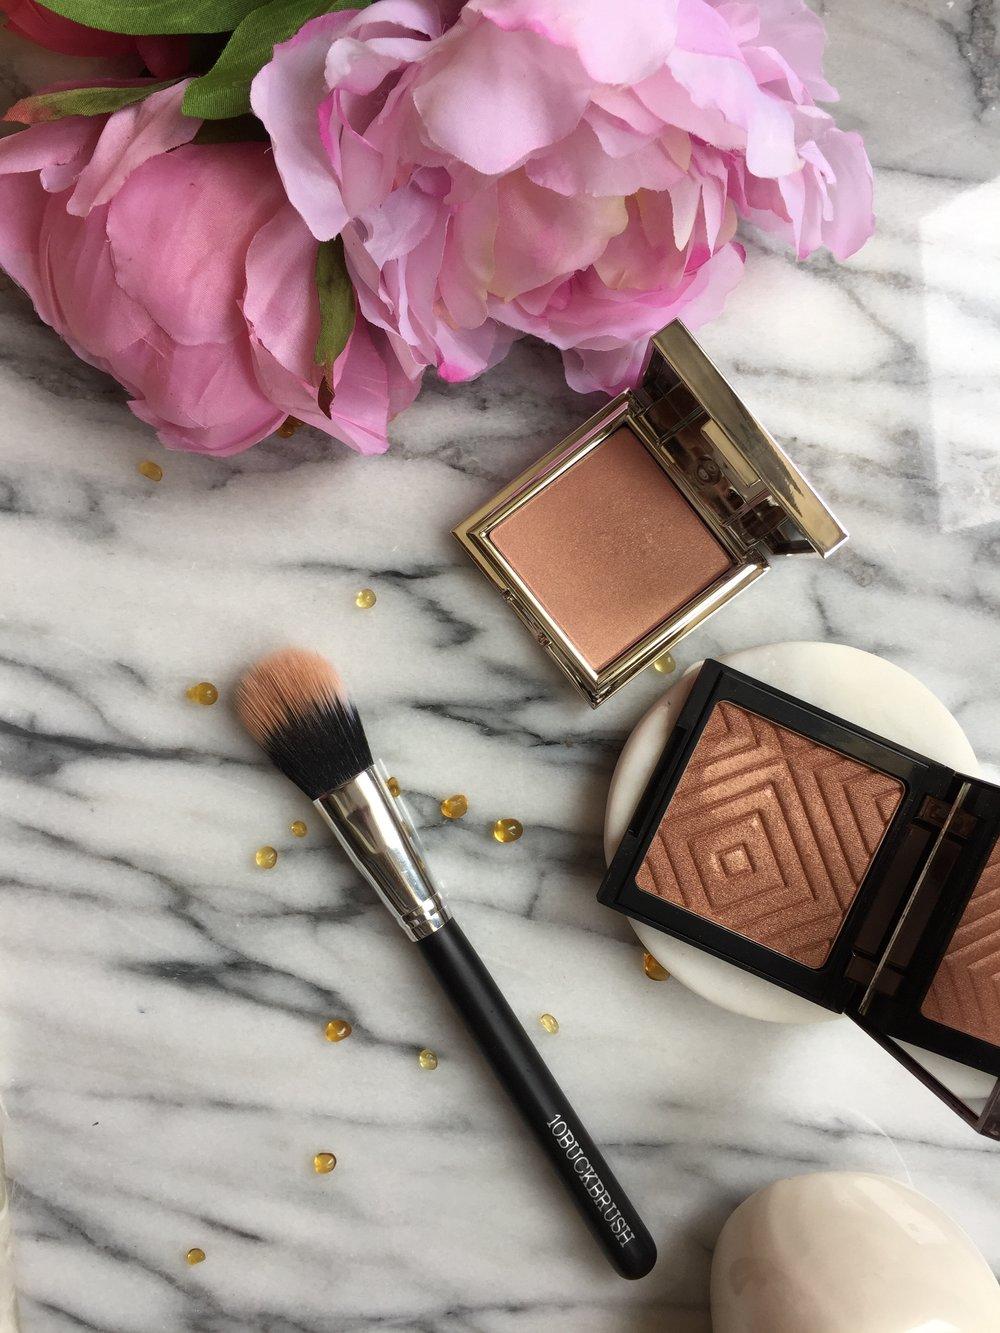 Makeup Geek Fireworks Highlighter and Jouer Rose Gold and Hanna Stippling Brush